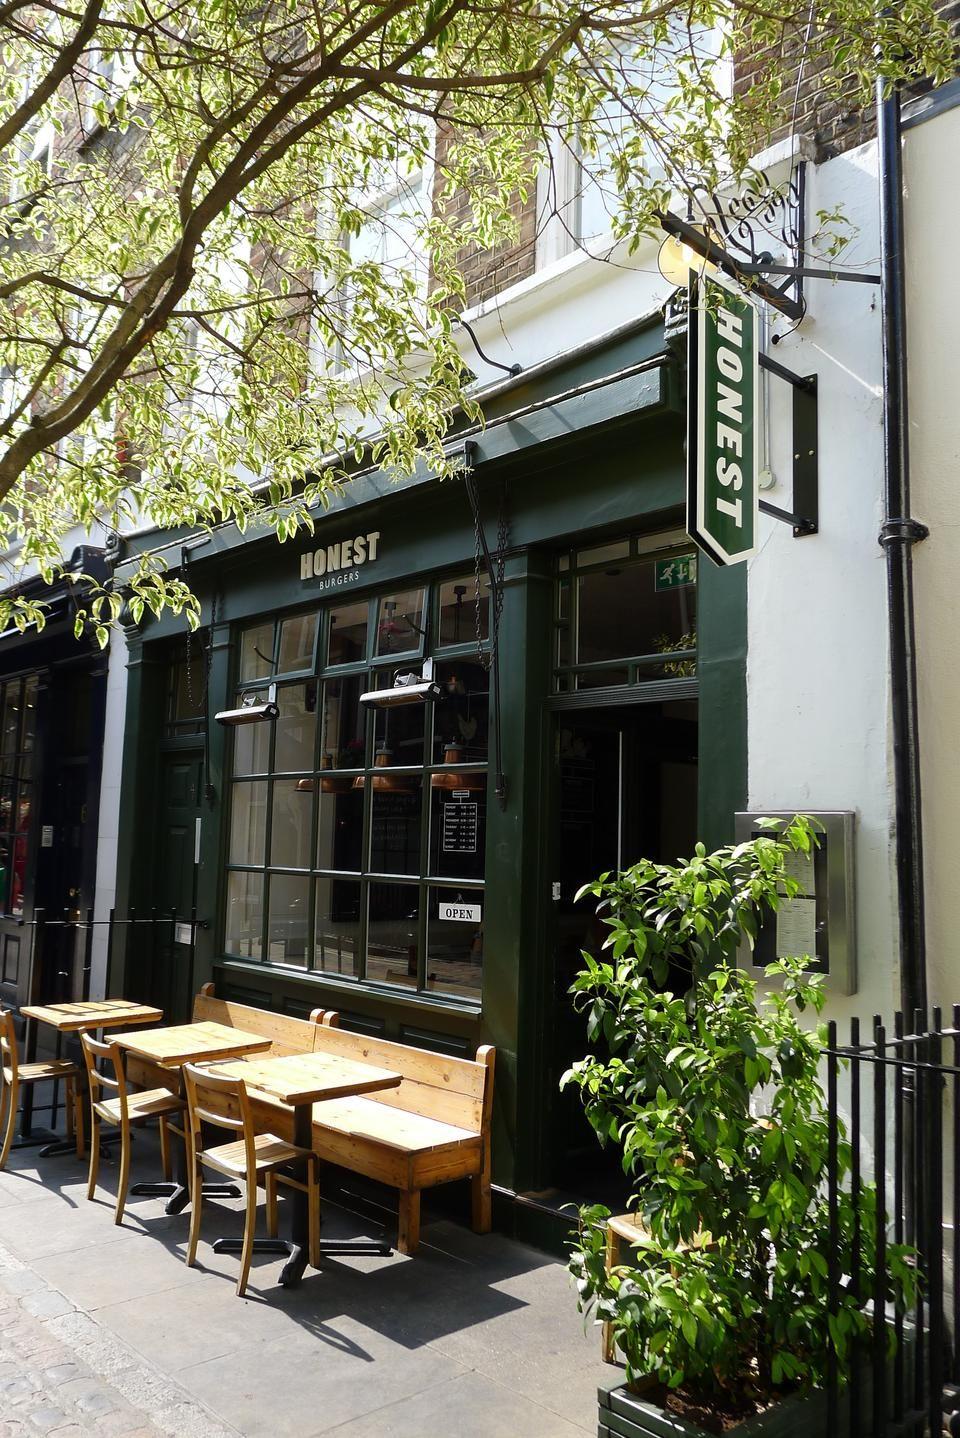 Honest Burger London Bar Restaurant Cafe Public